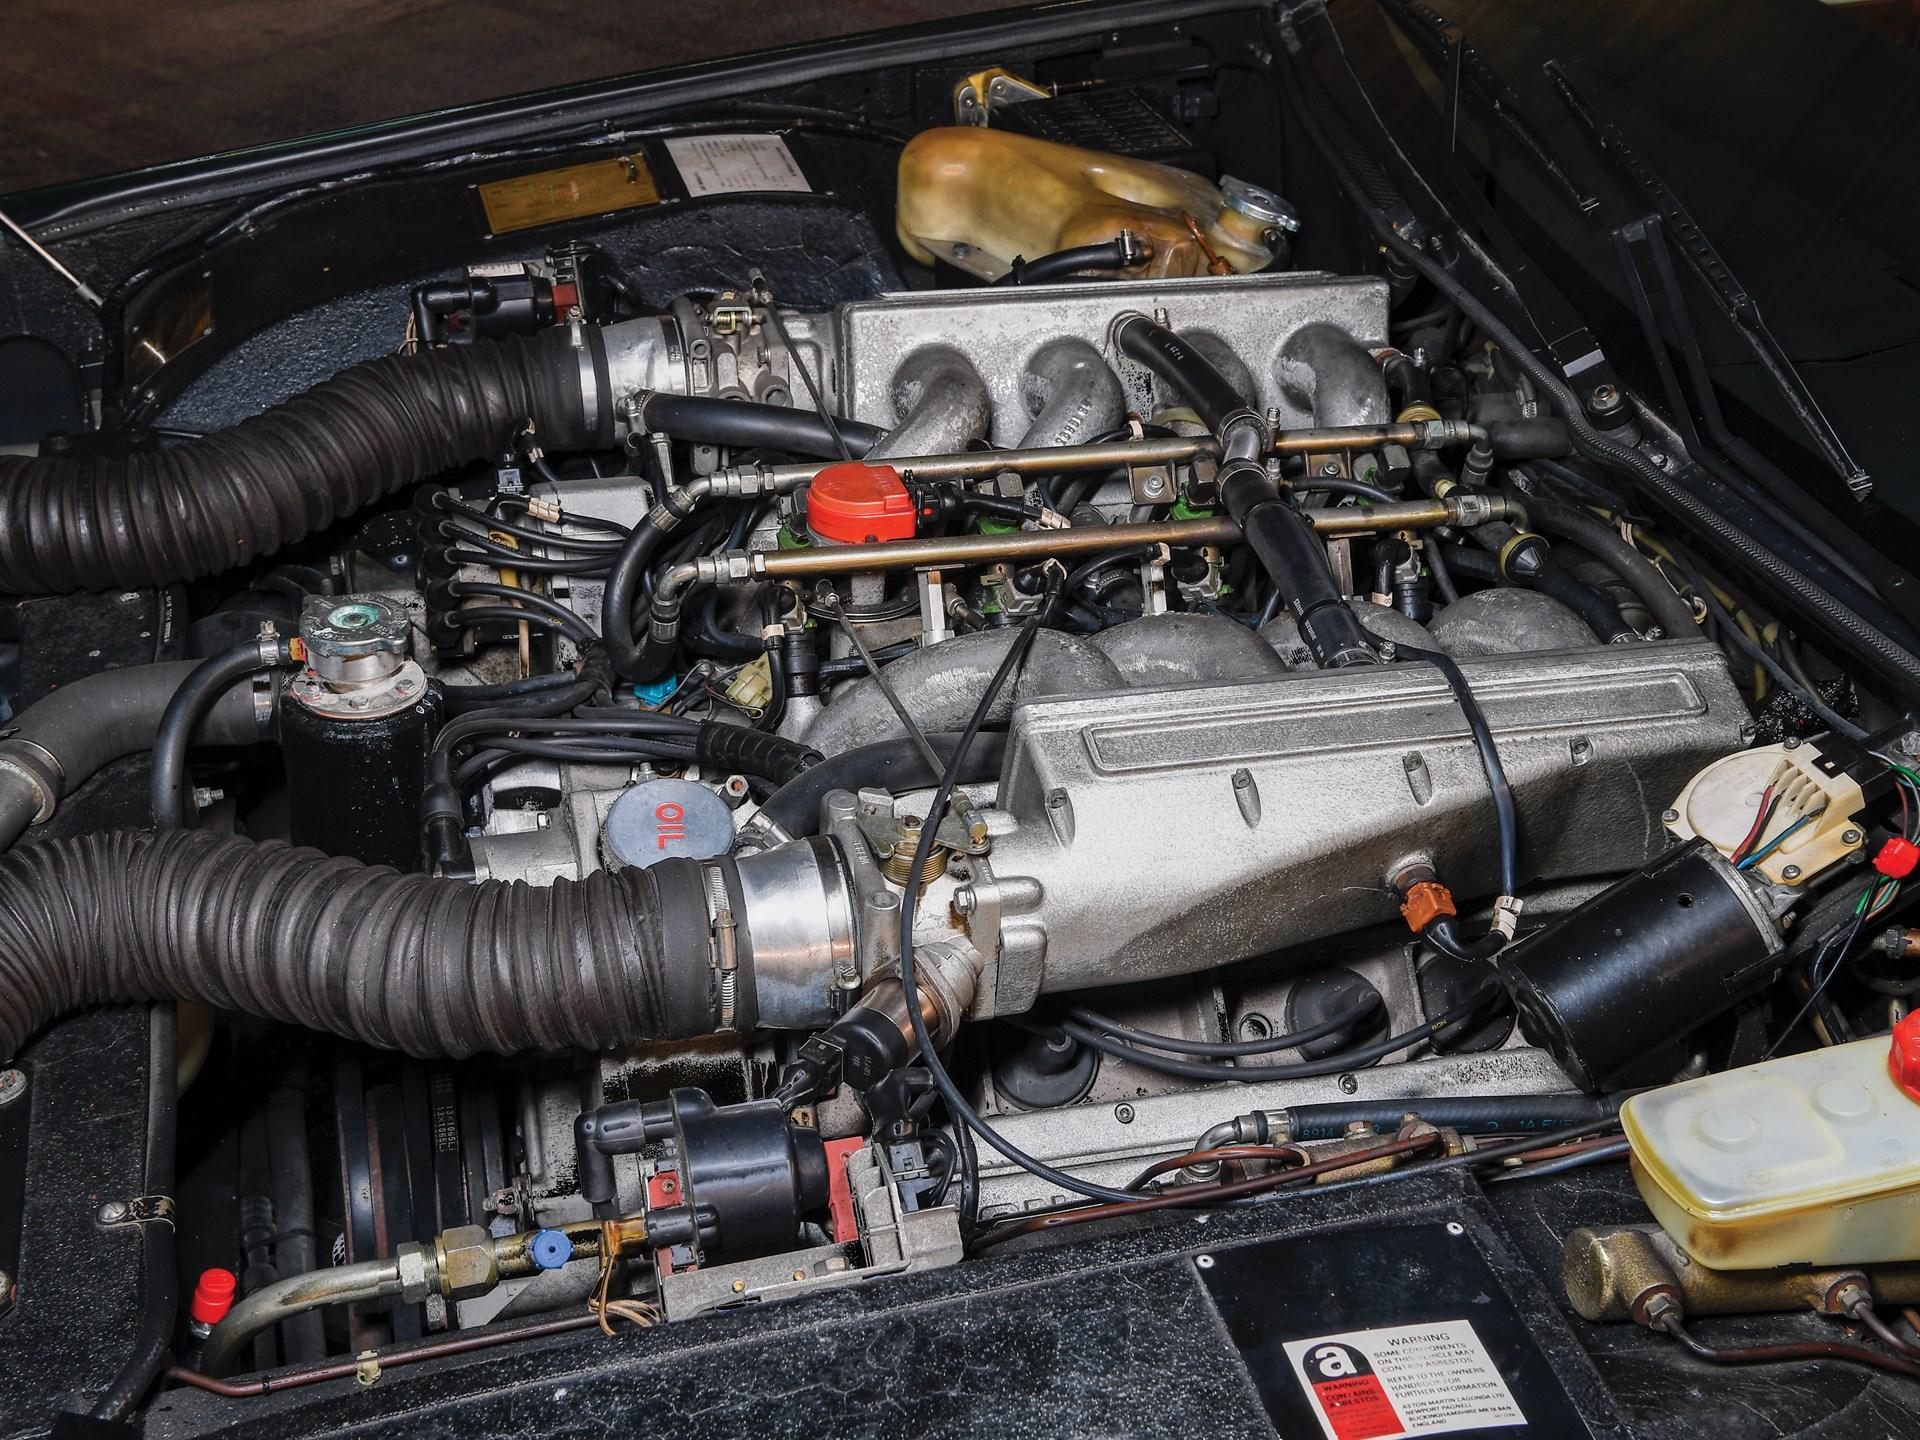 1989 Aston Martin Lagonda Series 4 engine